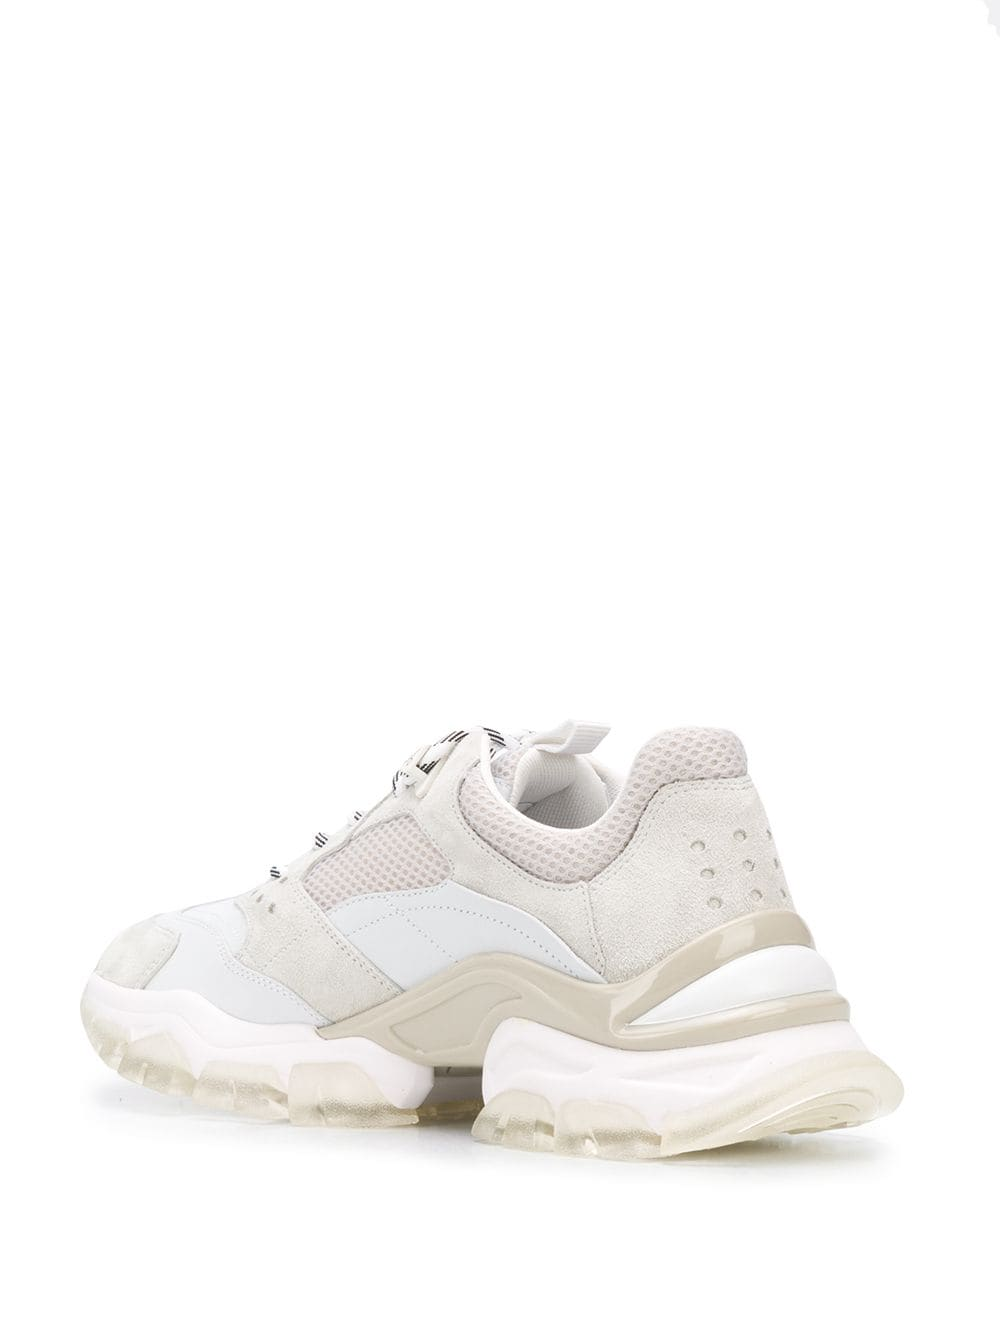 Moncler Leave No Trace Sneaker Beige